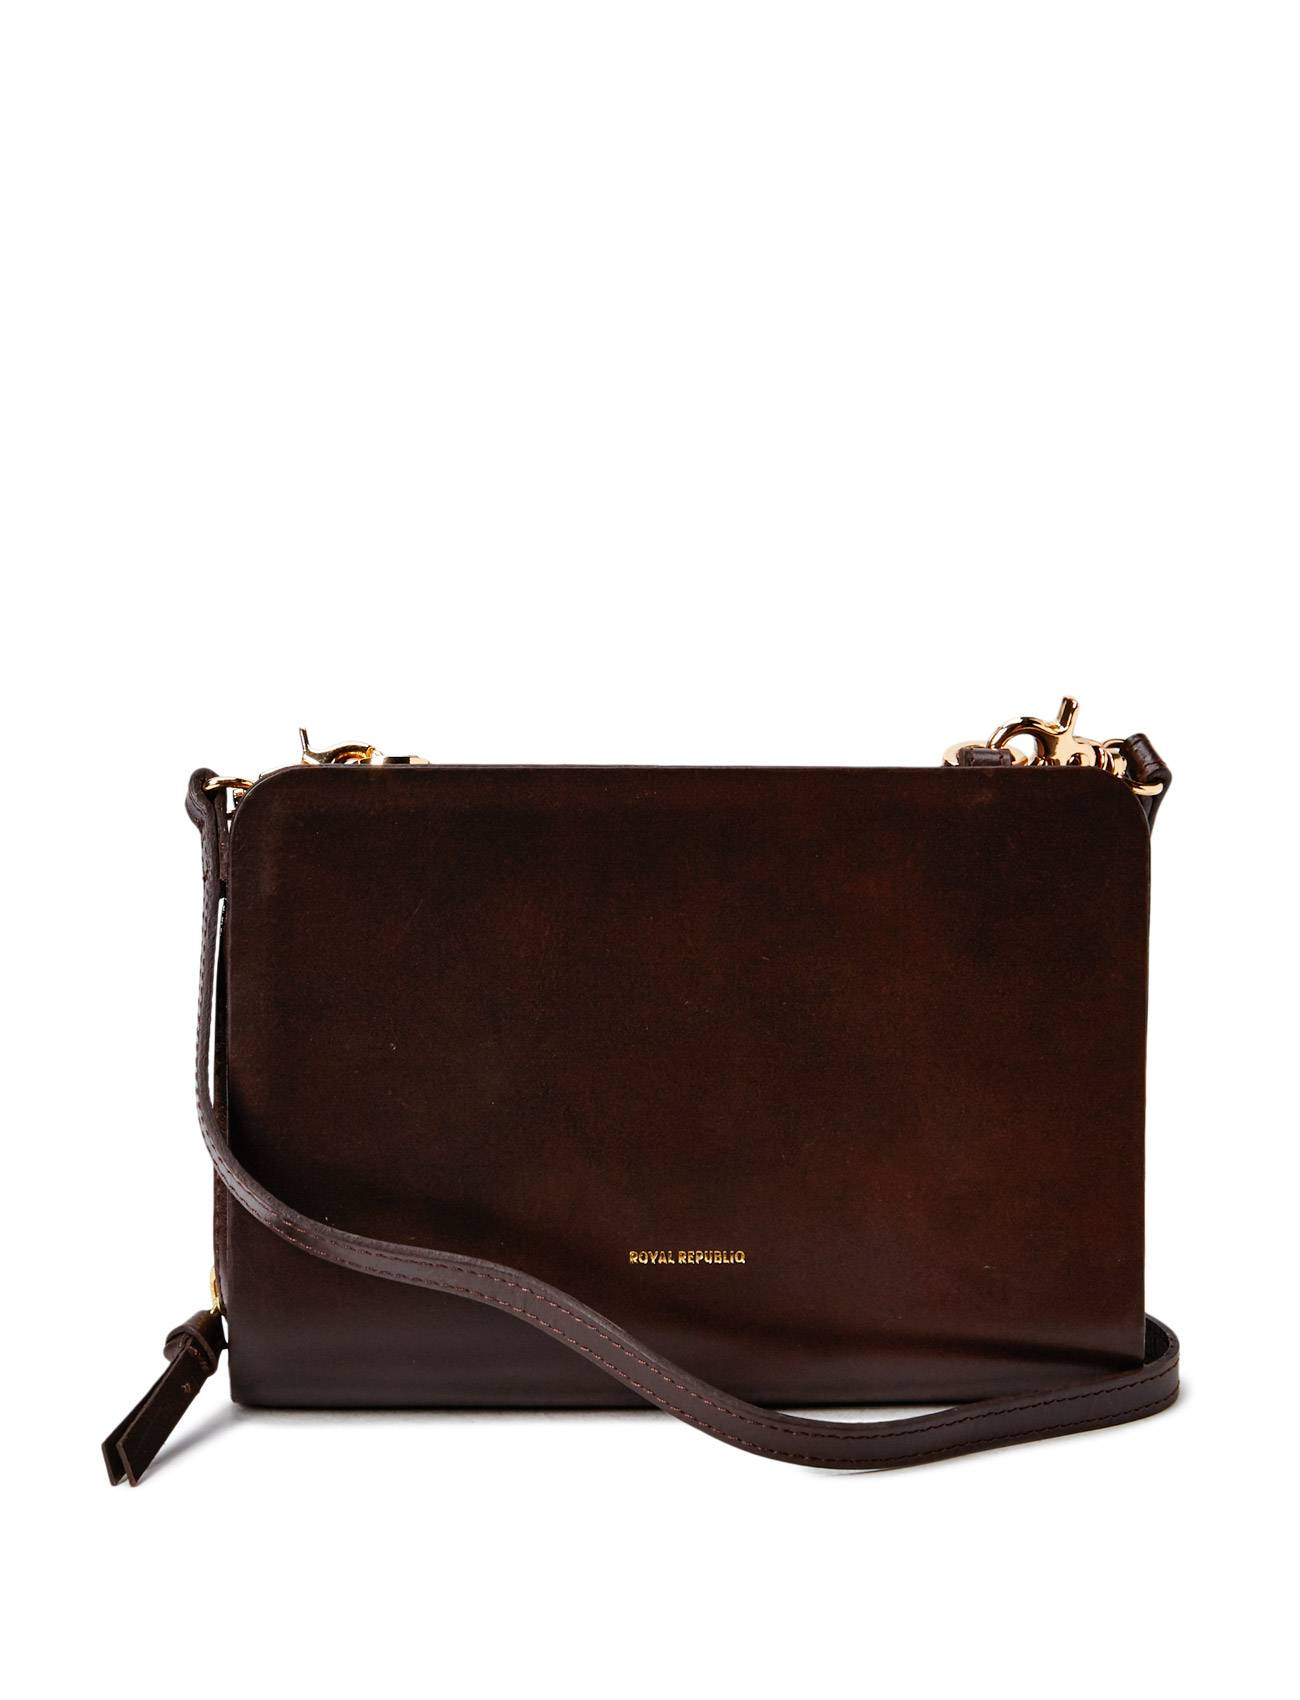 Royal RepubliQ Galax Eve Bag